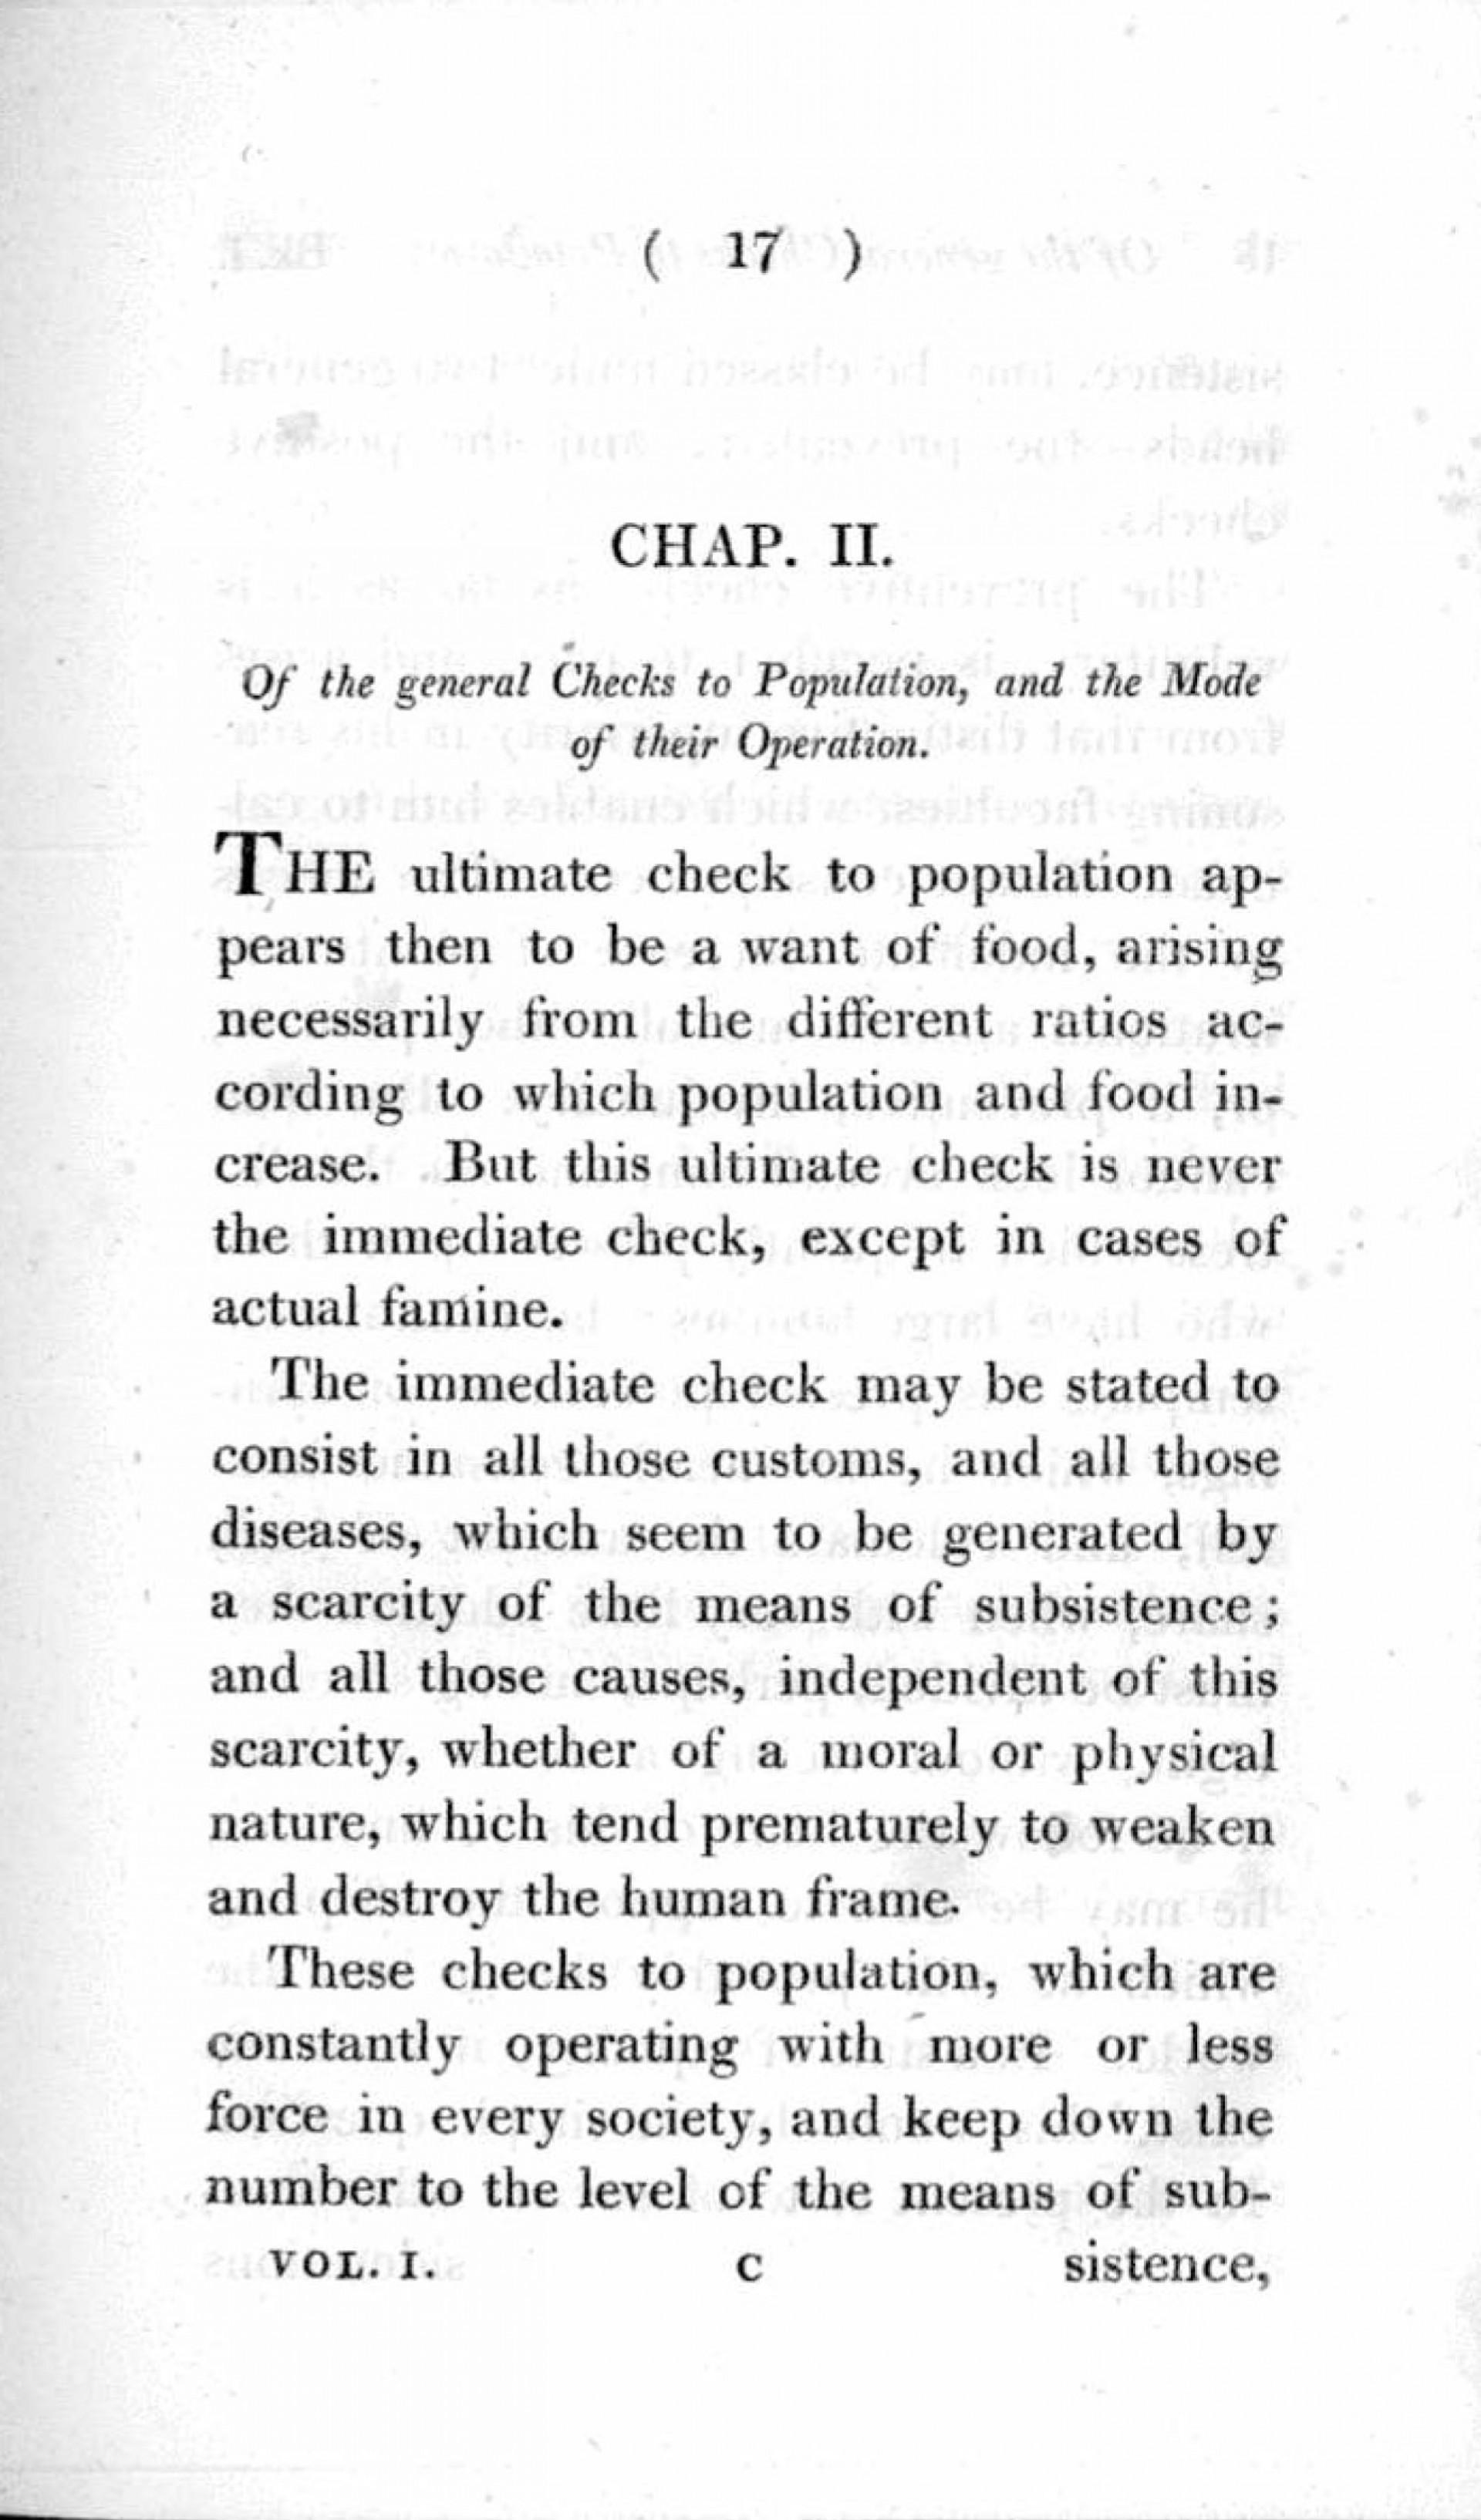 009 Thomas Malthus Essay On The Principle Of Population Stupendous After Reading Malthus's Principles Darwin Got Idea That Ap Euro 1920